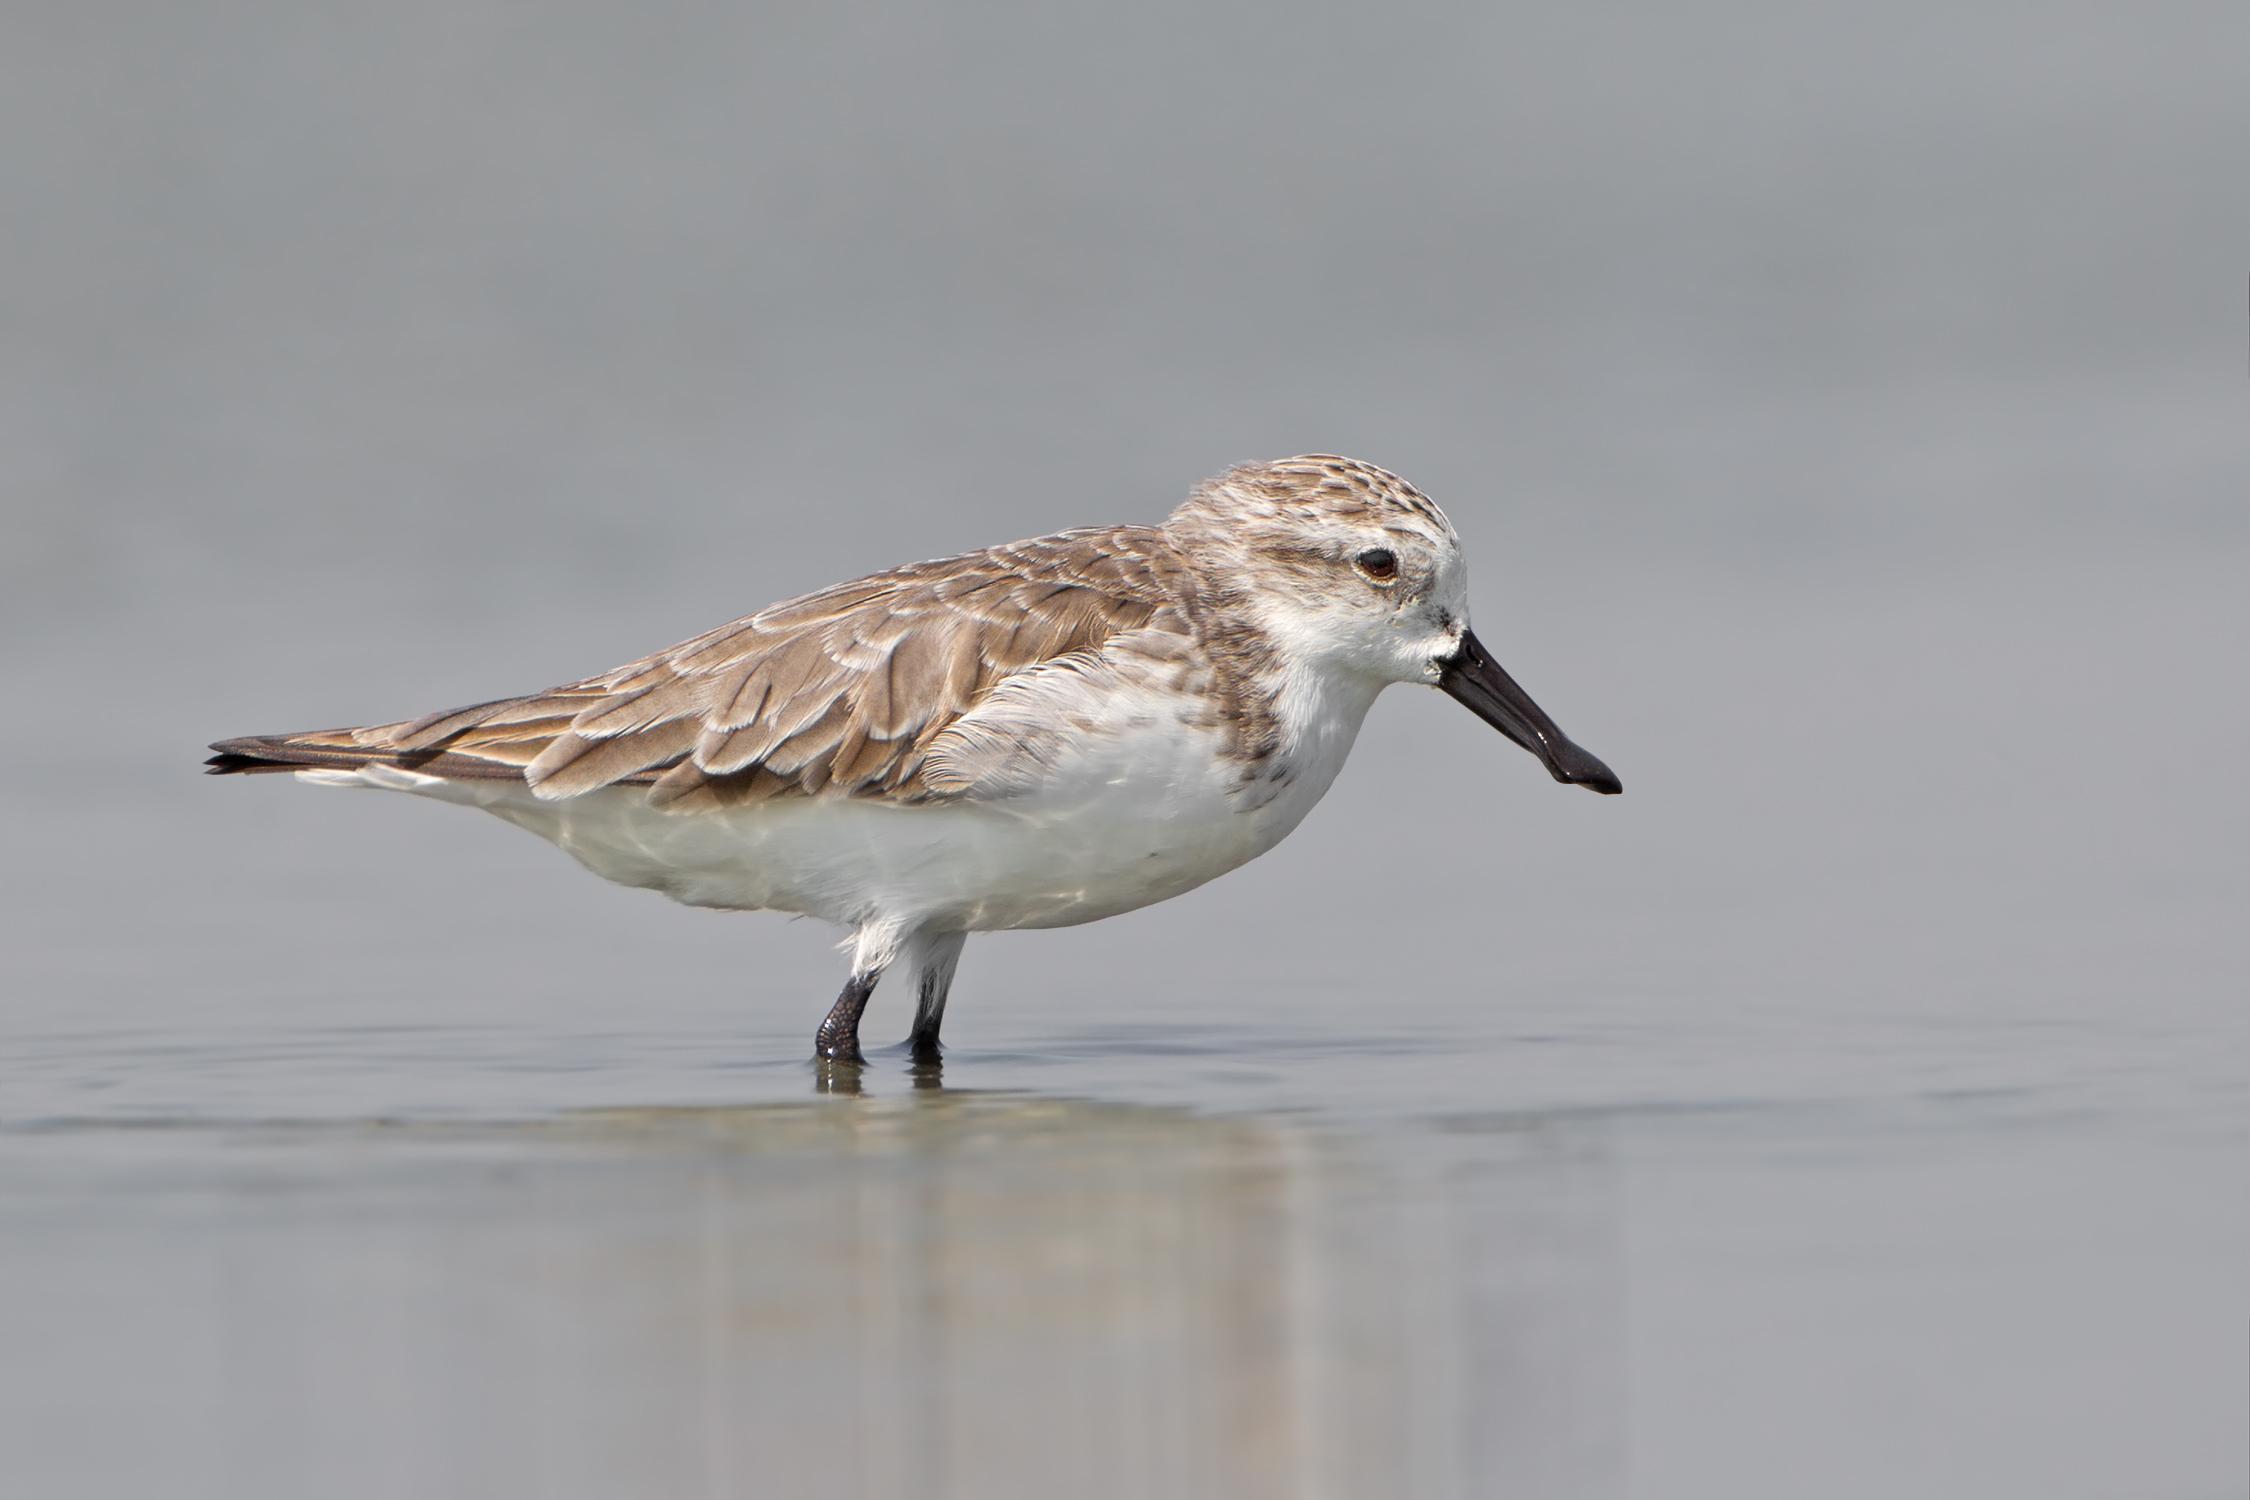 Spoon-billed Sandpiper ( Eurynorhynchus   pygmeus ) |  JJ Harrison/Wikimedia Commons  [ CC BY-SA 3.0 ]